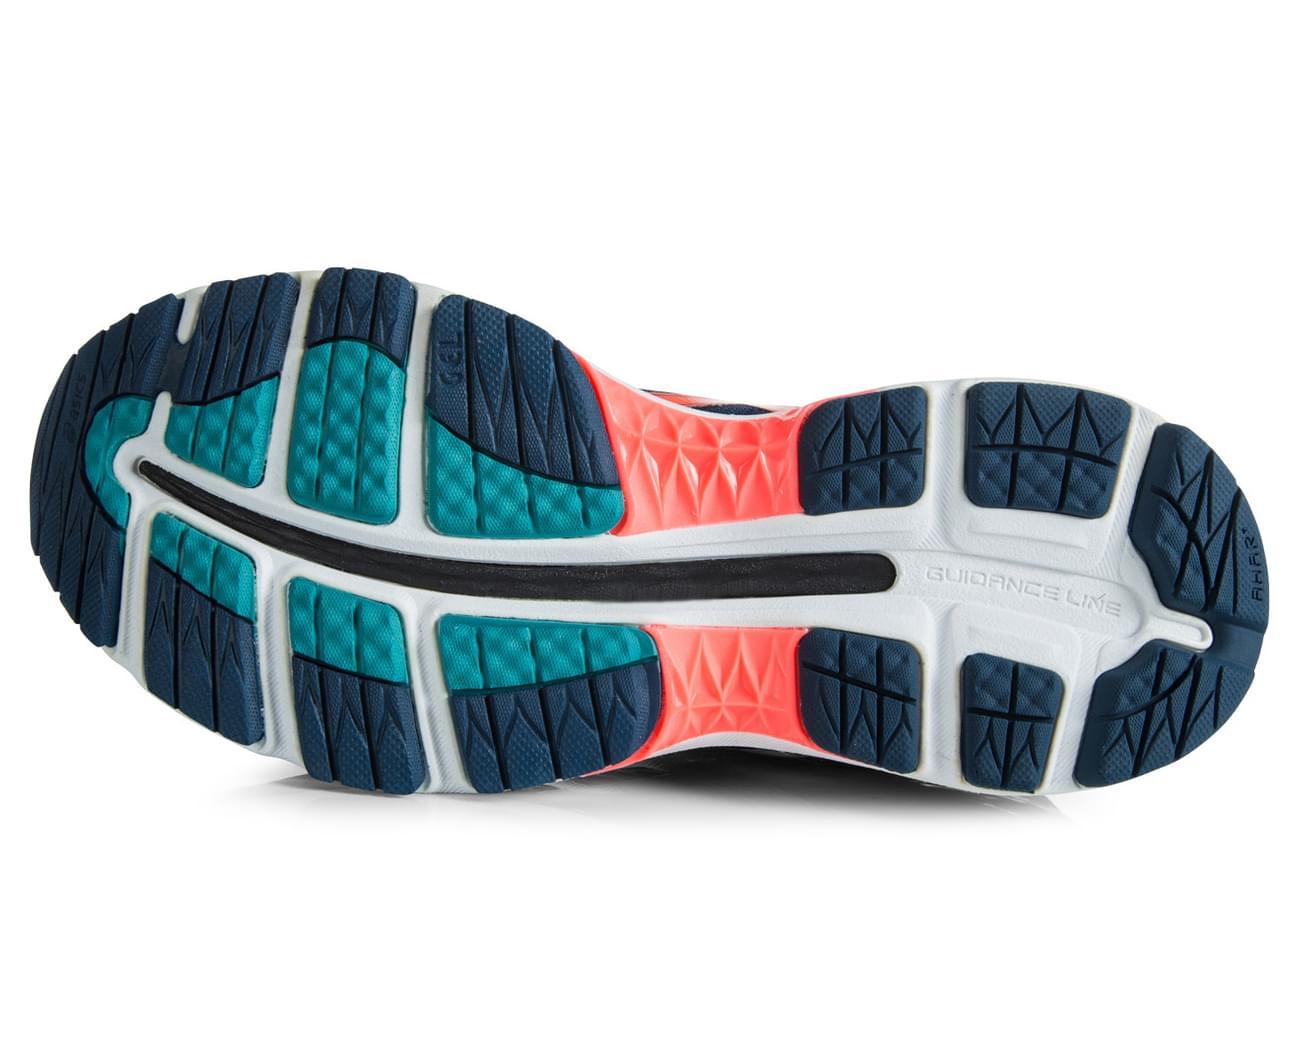 Asics 18 Zapato Gel Nimbus De Las Mujeres - Poseidon / Flash De Coral / Negro 2ouc006oB